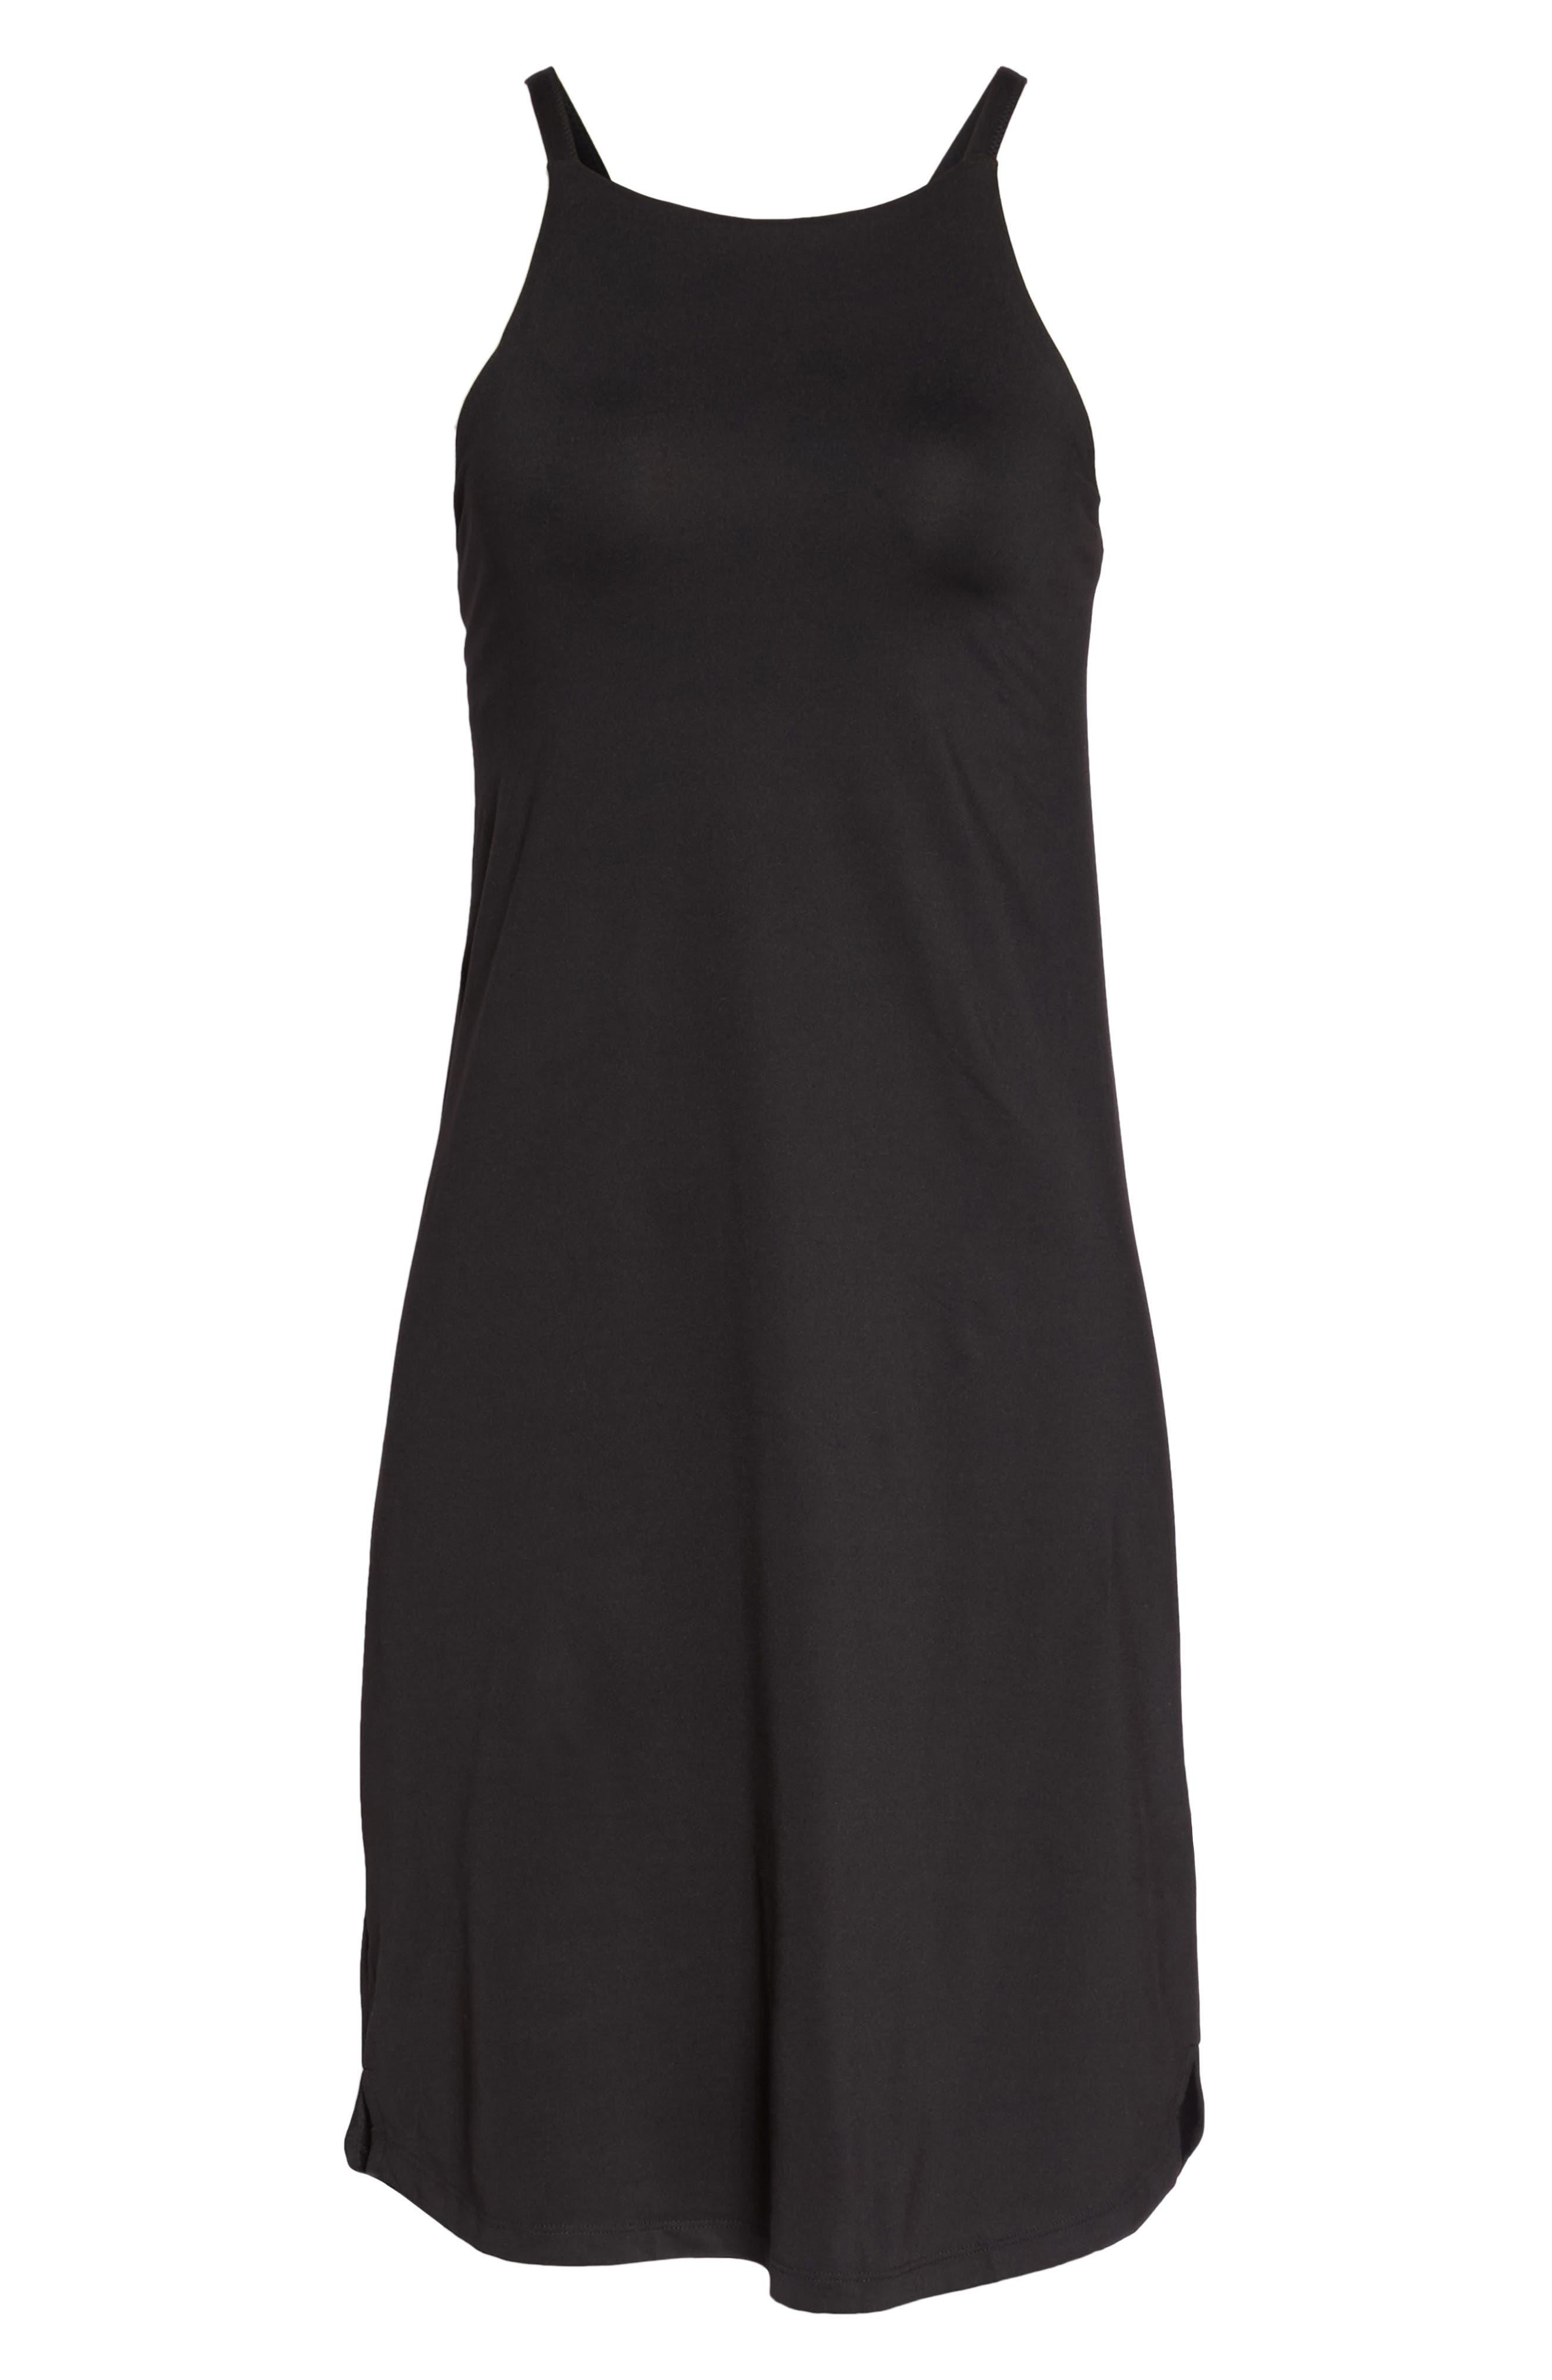 Sliding Rock Dress,                             Alternate thumbnail 7, color,                             BLACK